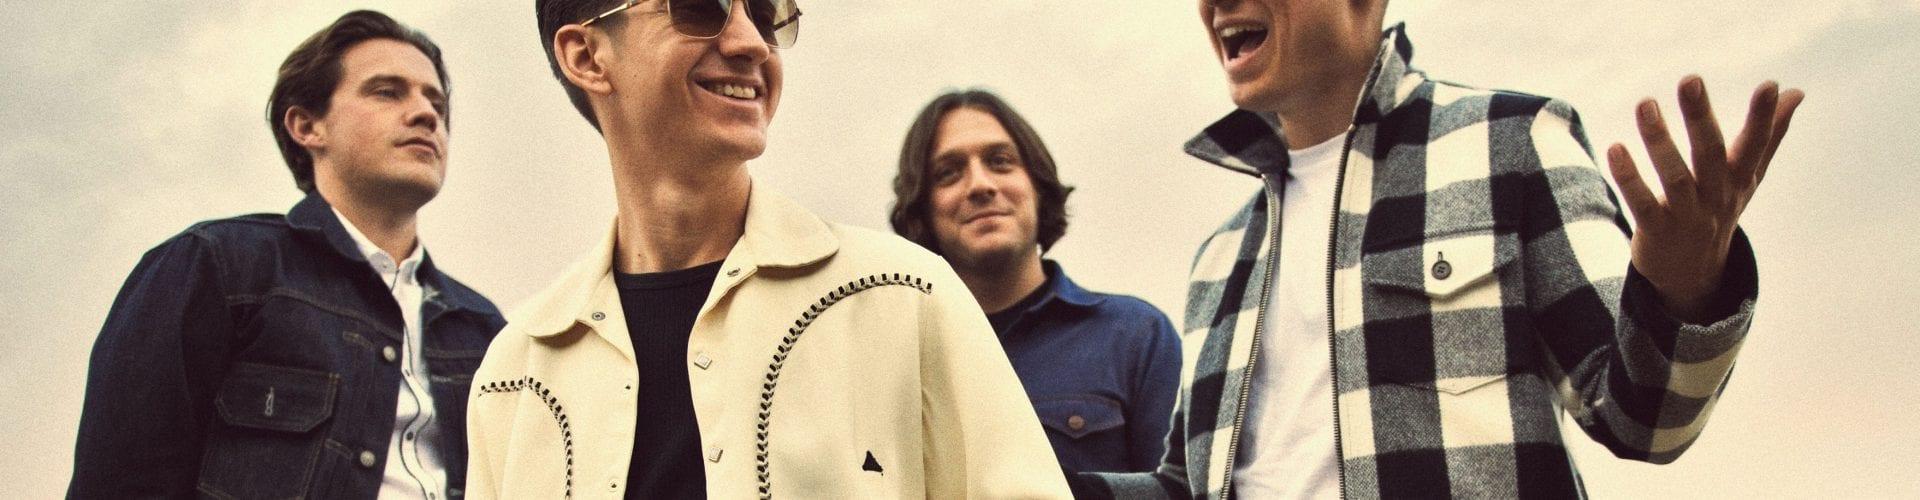 Arctic Monkeys Announce New Record, More UK Dates